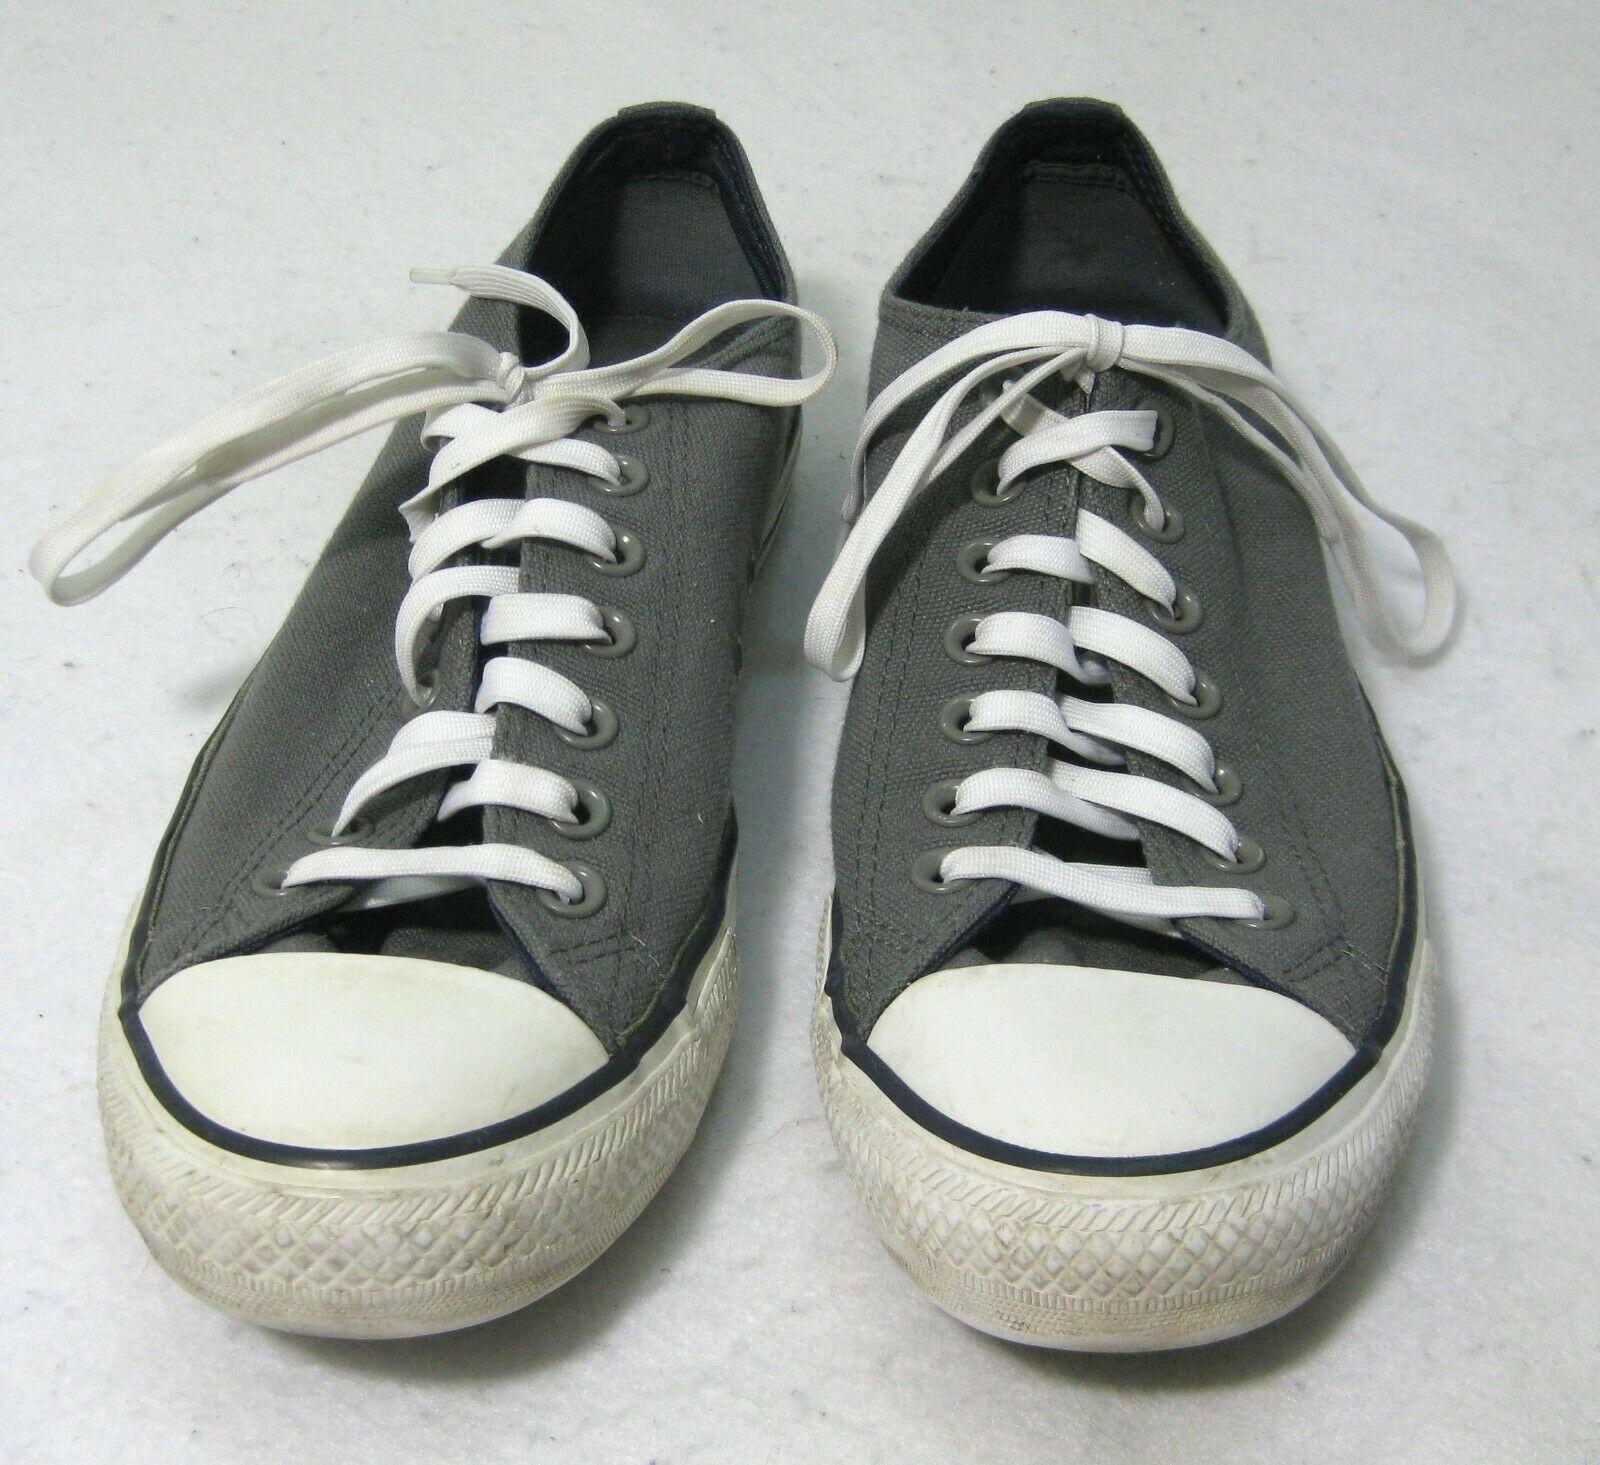 9b2d2177e798 Converse All Star Gray Canvas Shoes (Mens 9